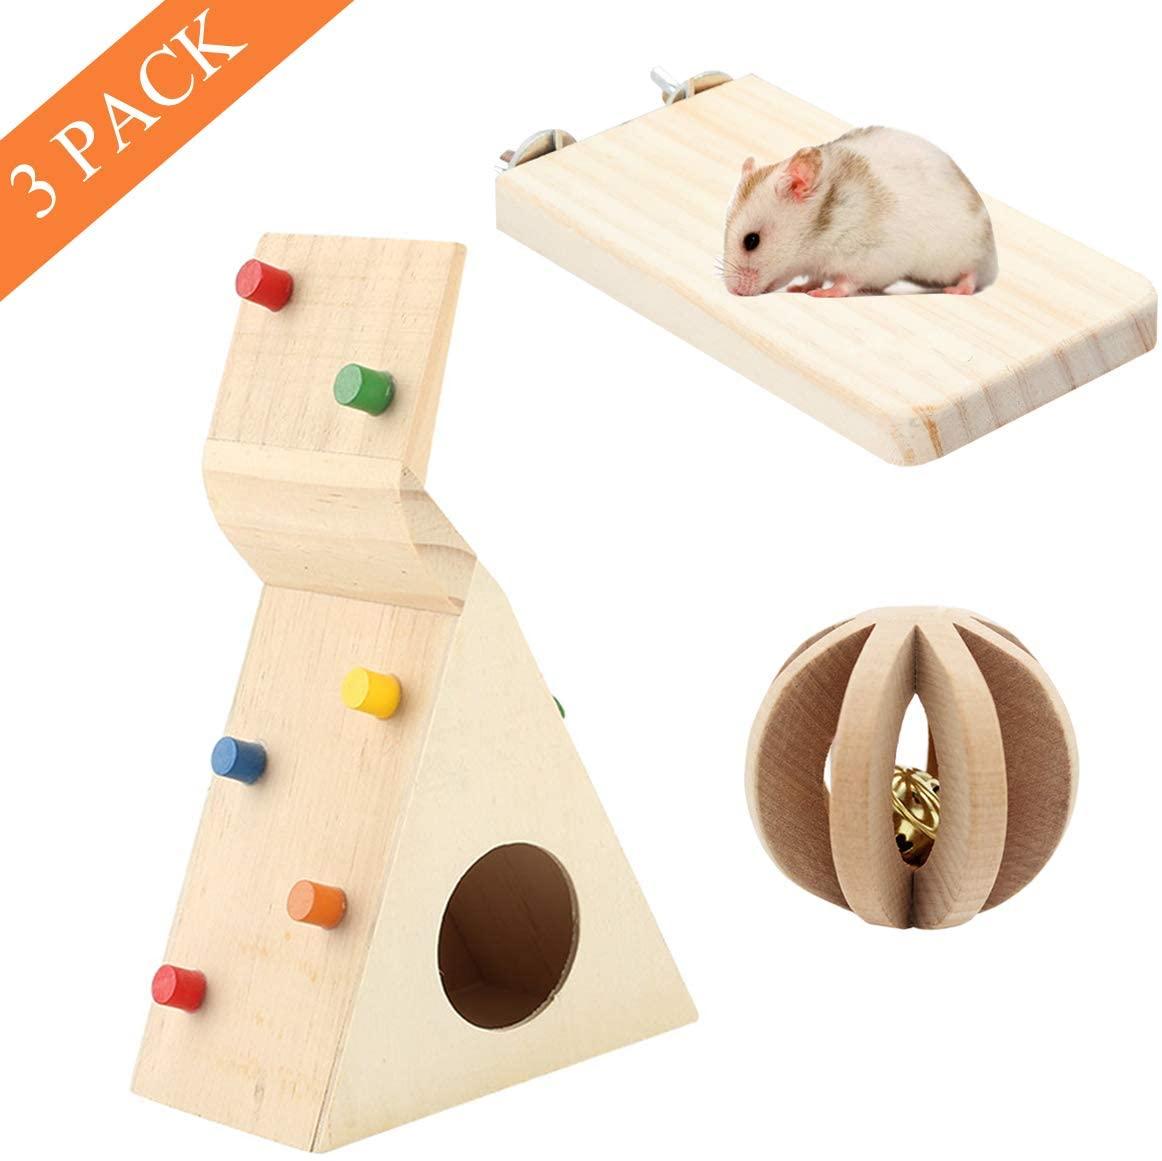 3 Pack Hamster Climbing Toy Wooden Swing Ladder and Resting Platform for Dwarf Hamster